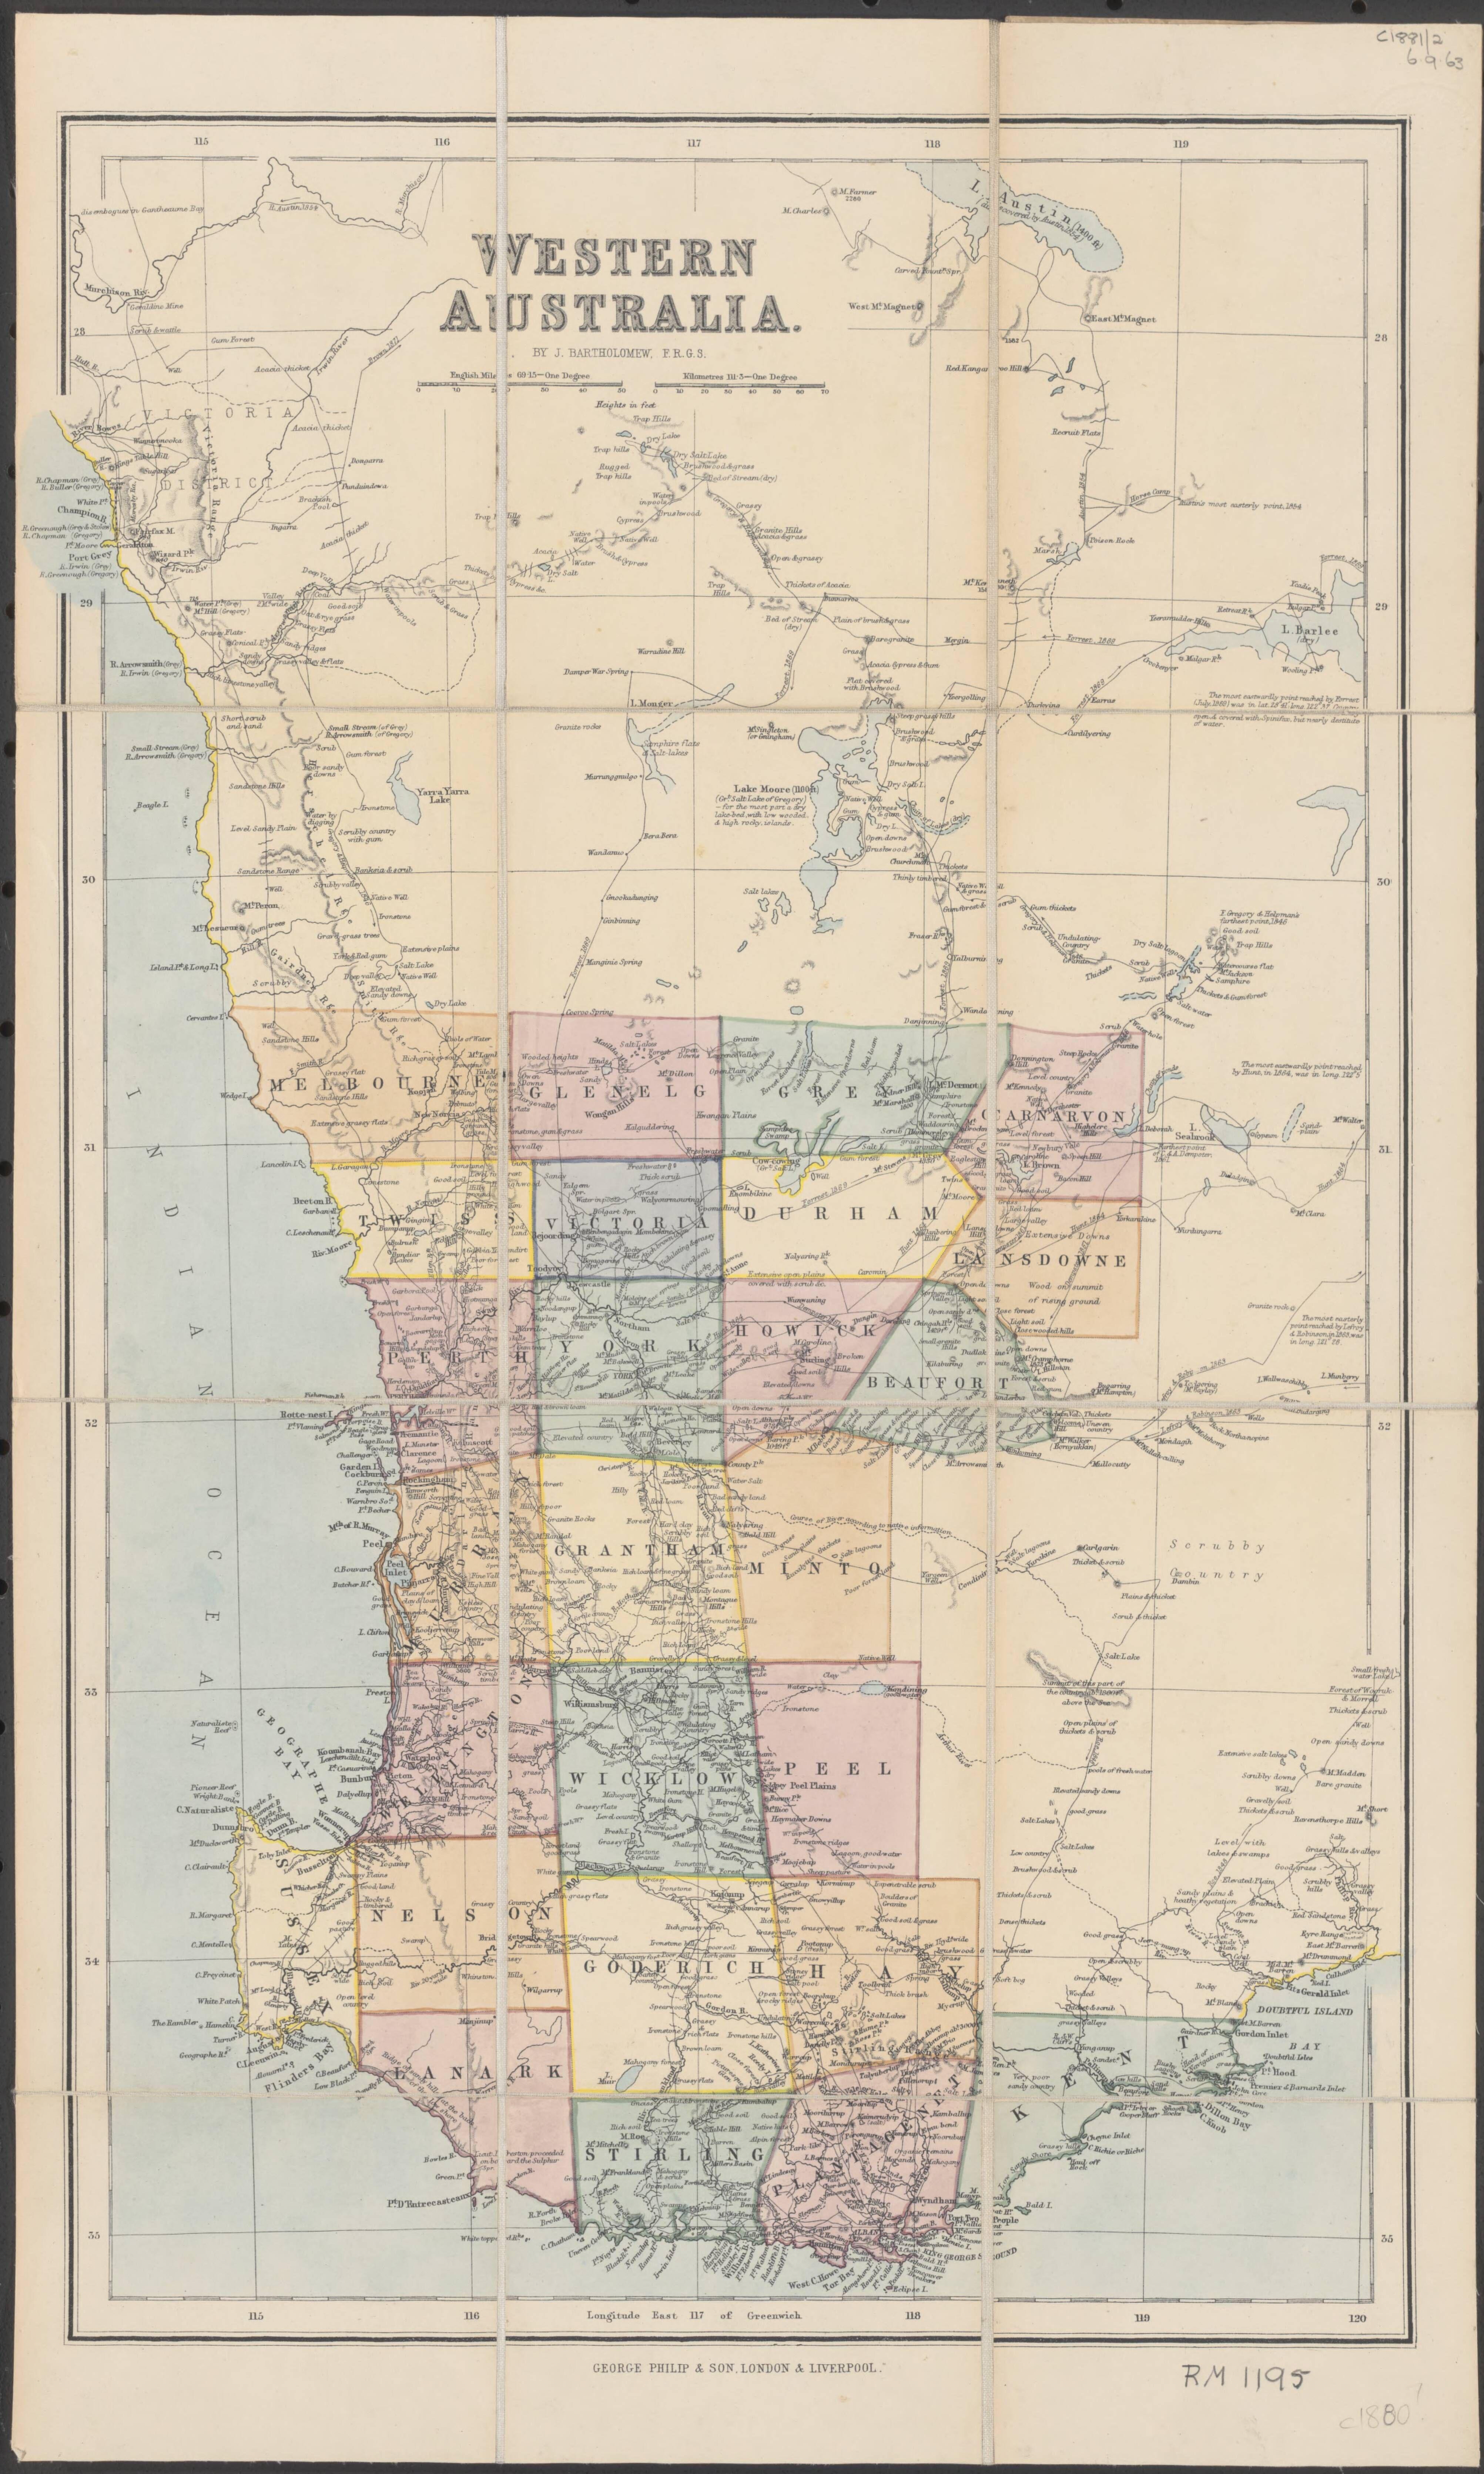 Map Of Australia 1880.1880 Map Of Western Australia Western Australia Australia Map